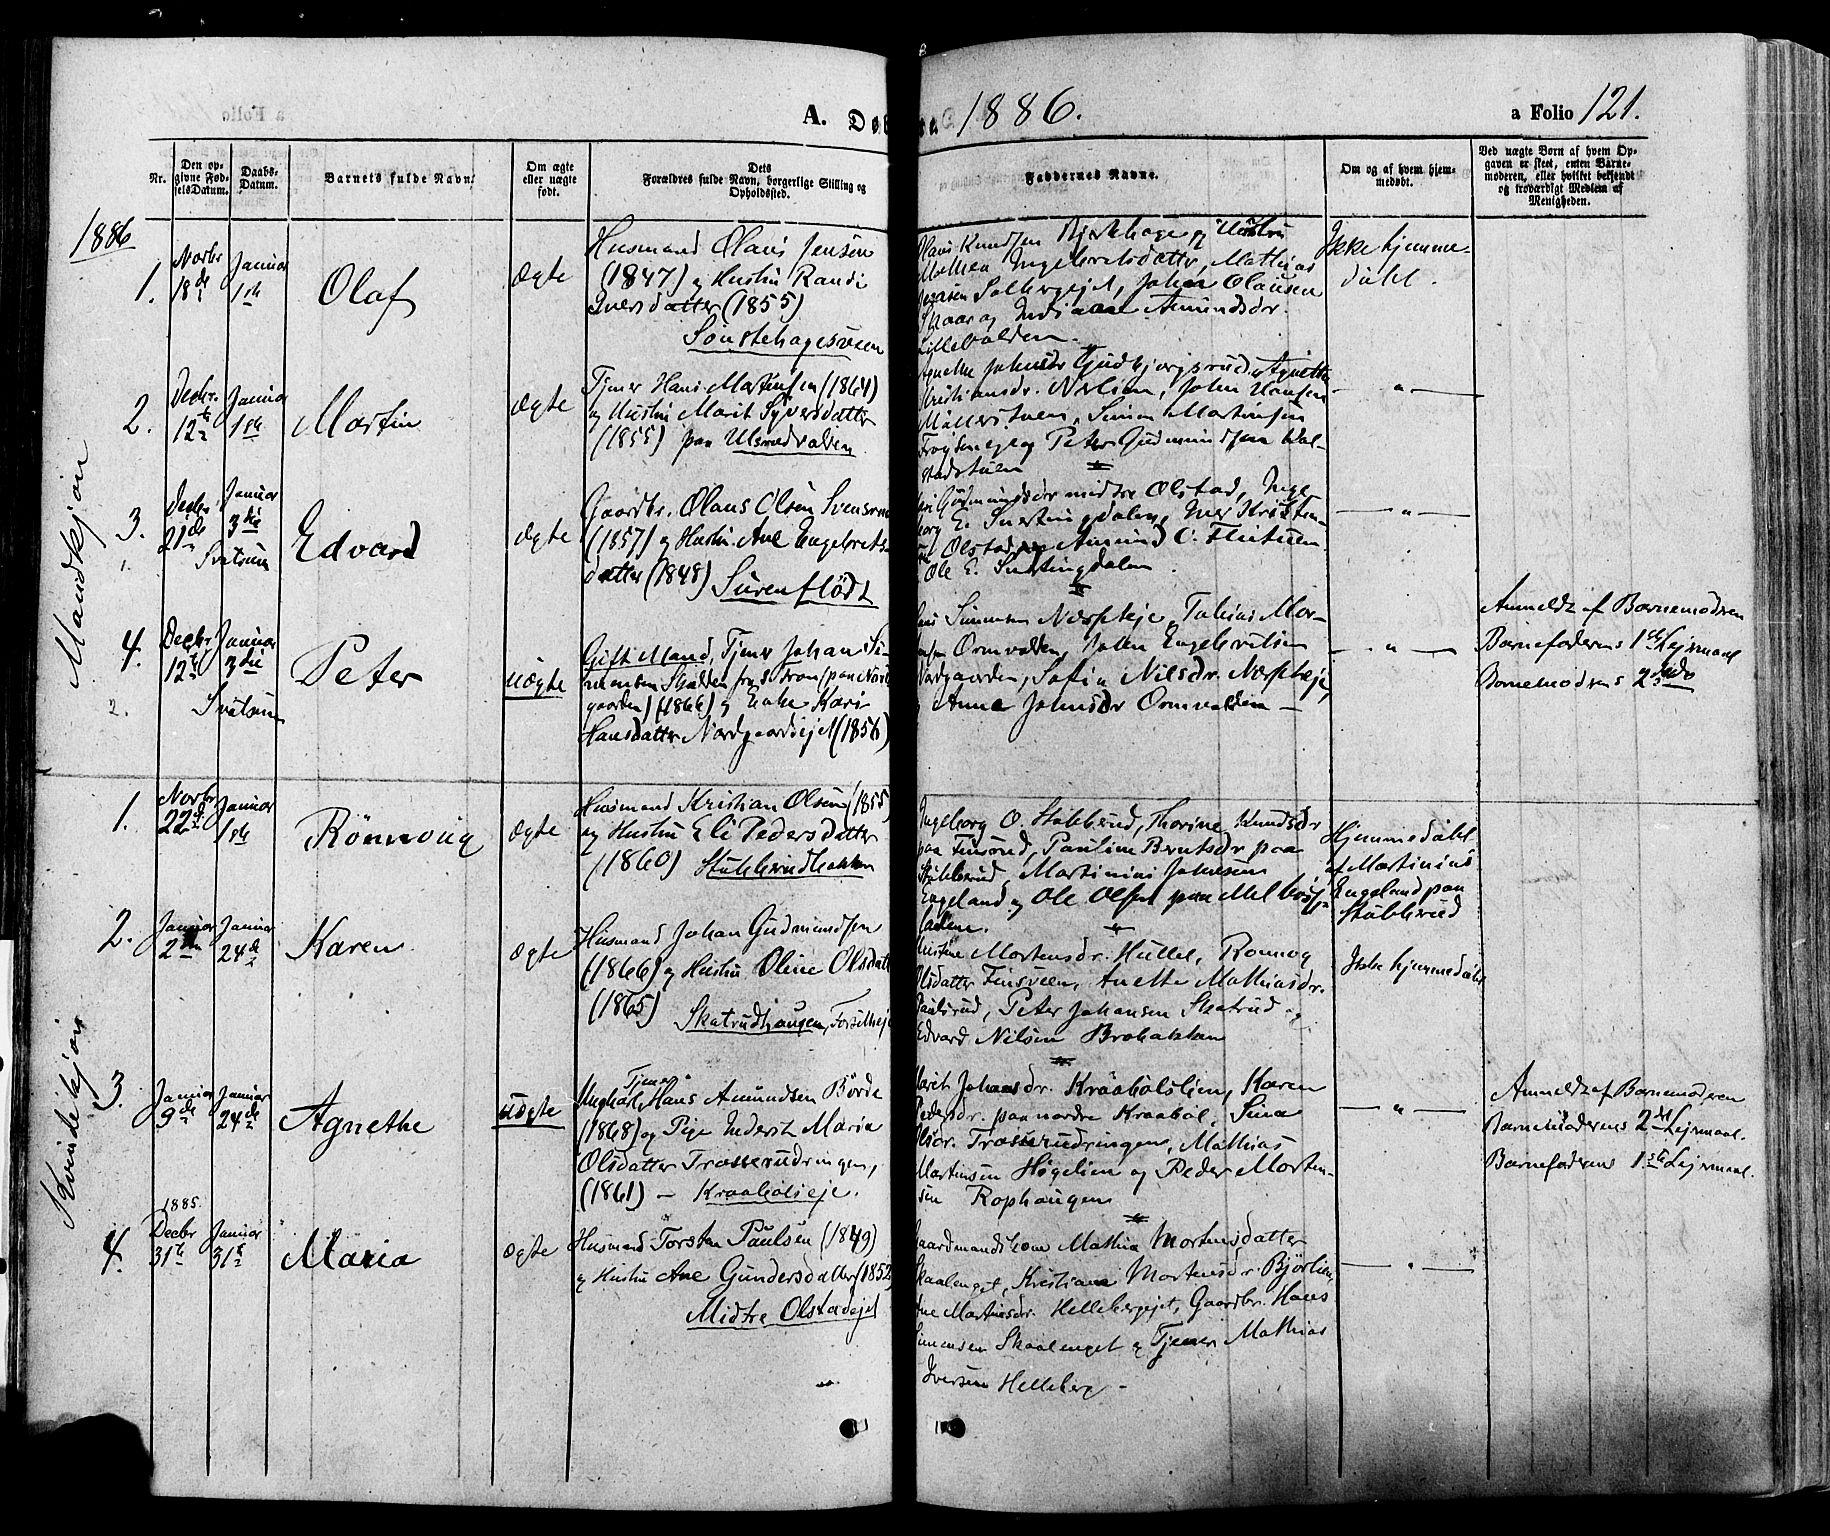 SAH, Gausdal prestekontor, Ministerialbok nr. 10, 1867-1886, s. 121